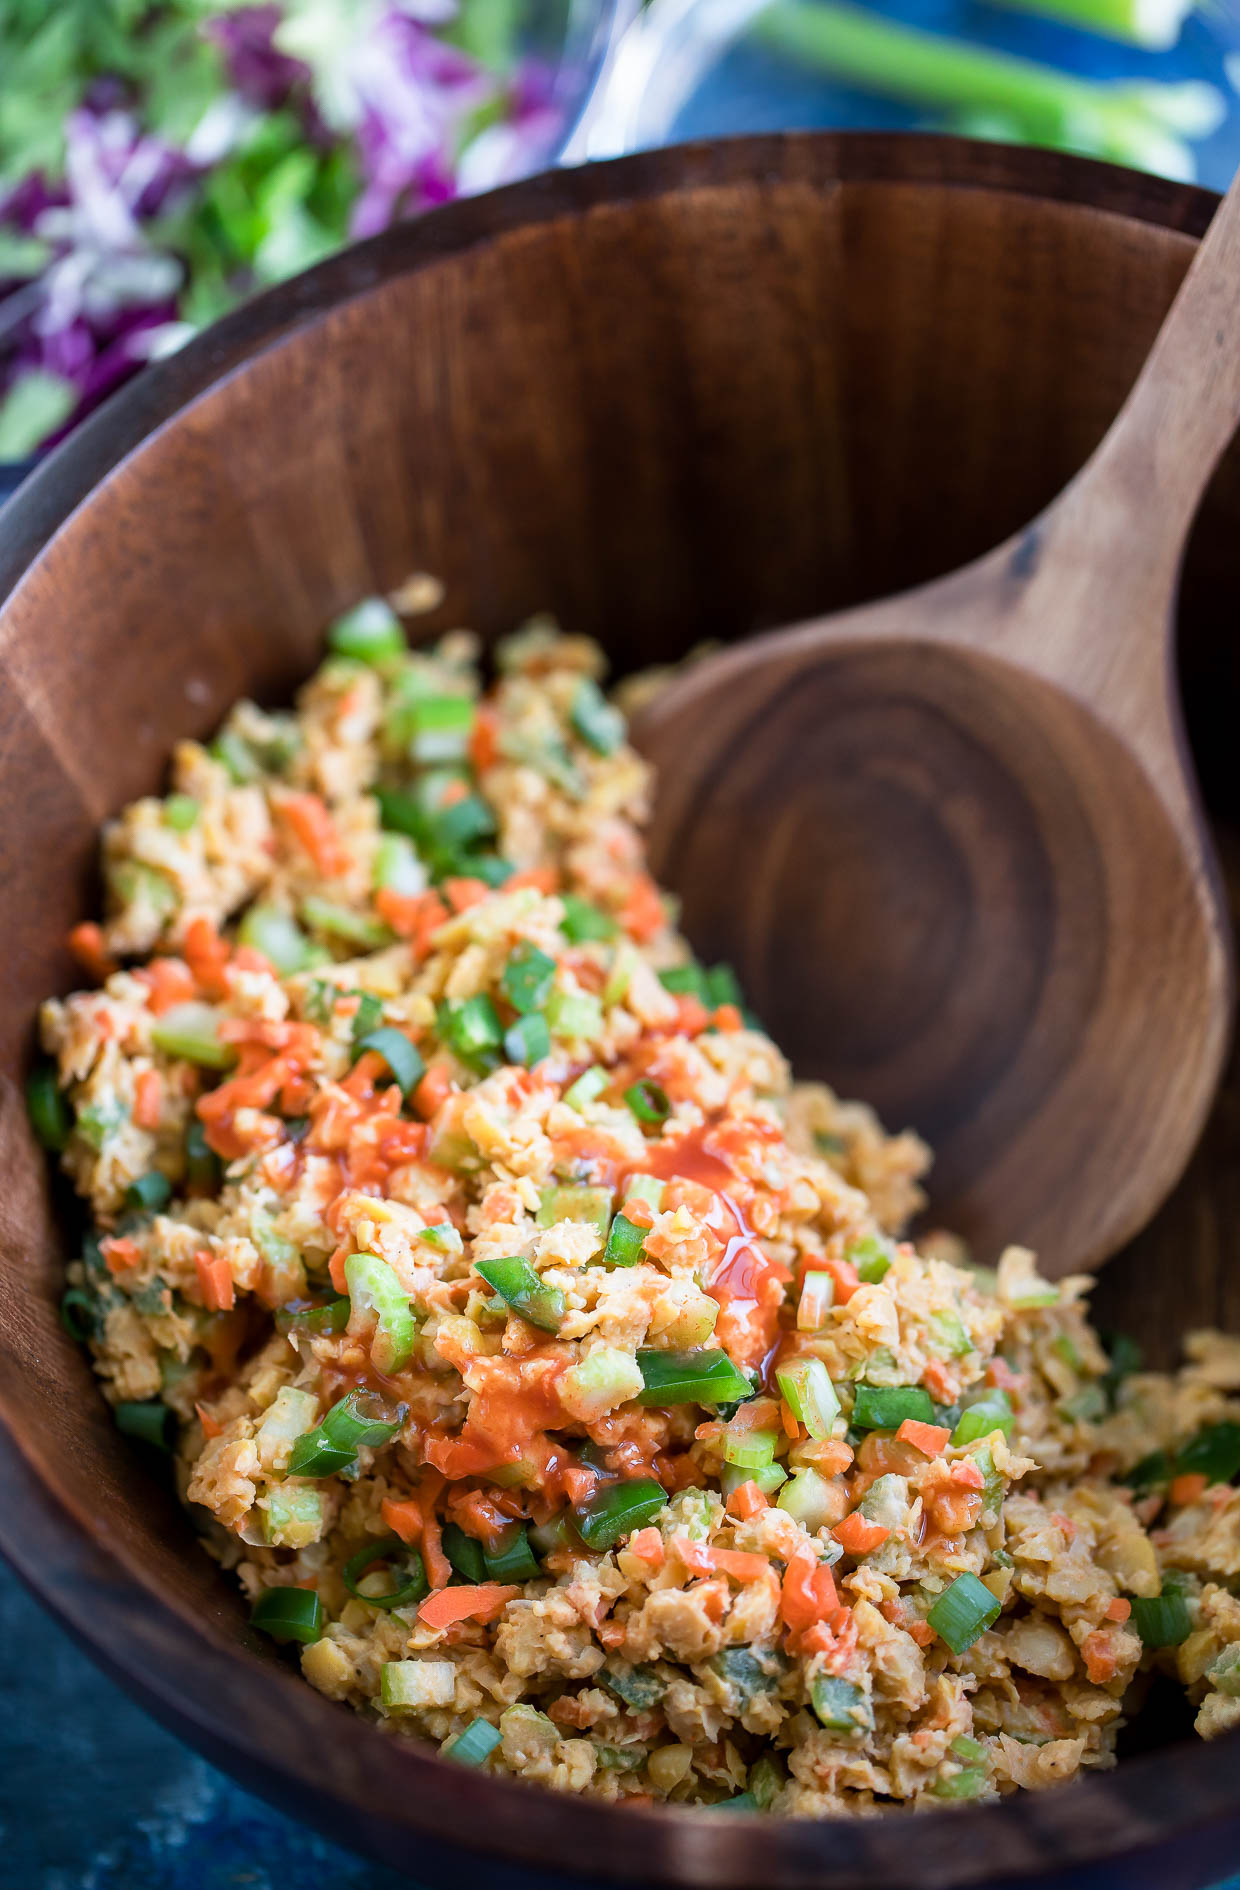 Vegan Buffalo Chickpea Salad